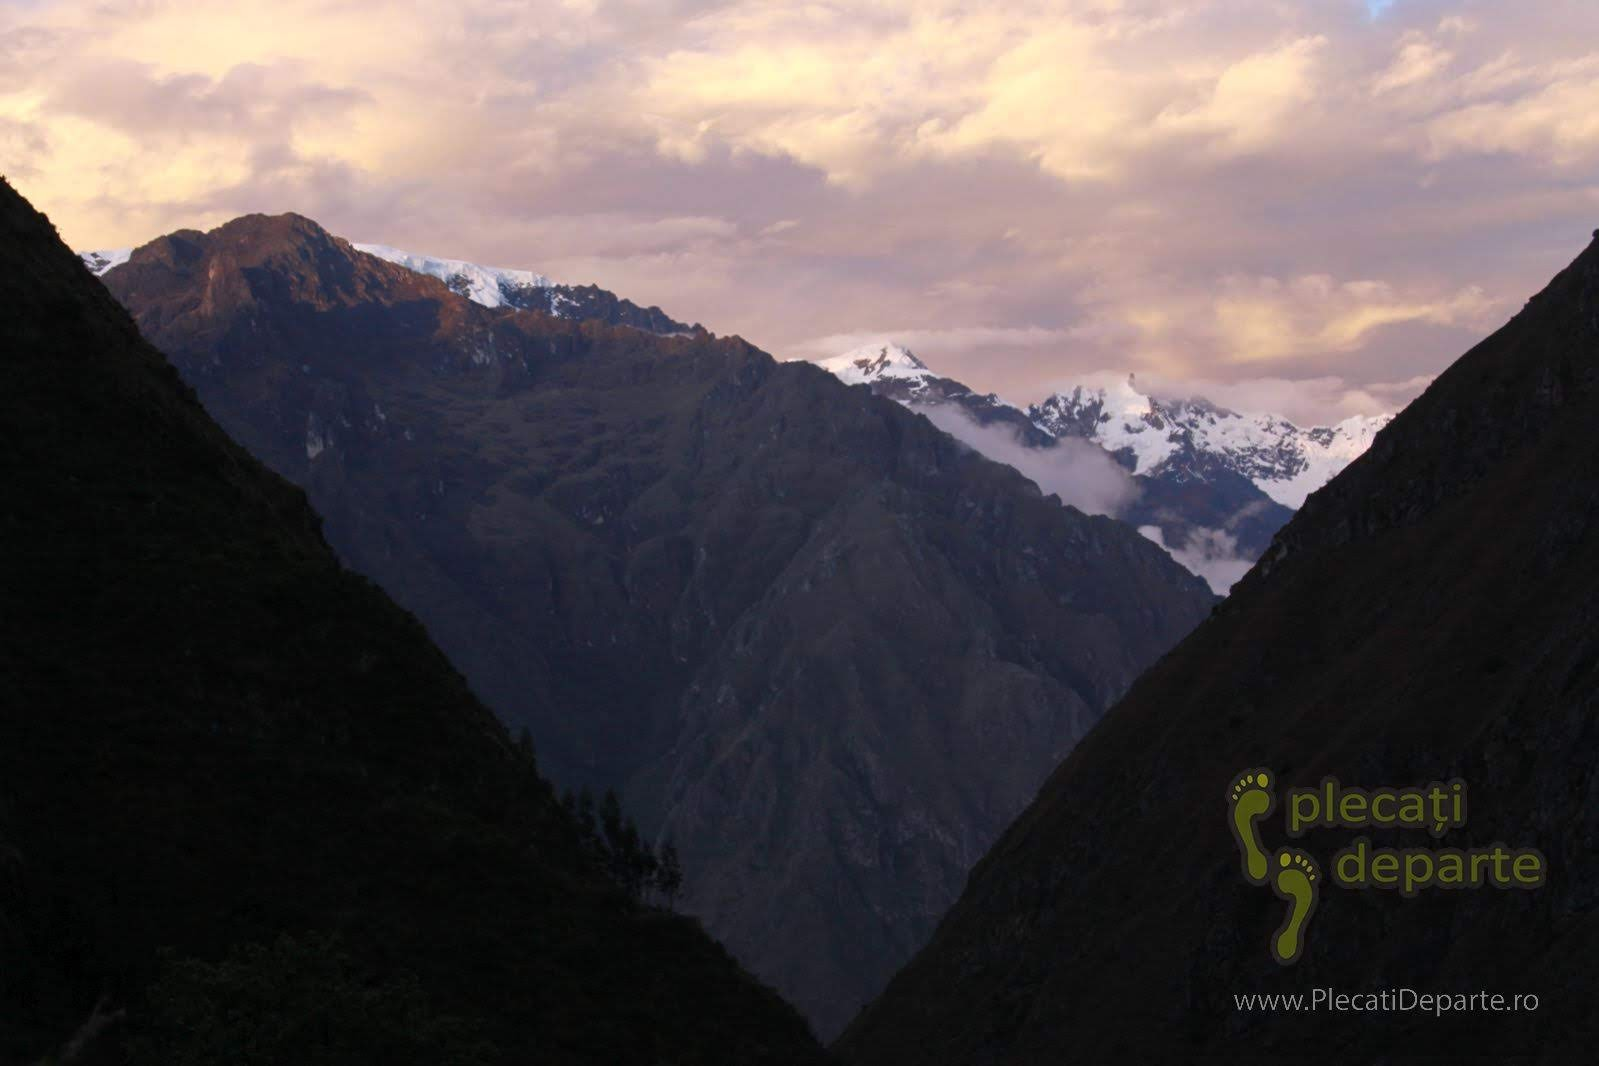 varful Nevado Veronica (5882m), acoperit de zapada, in muntii Anzi, vazut de pe Inca Trail la apus